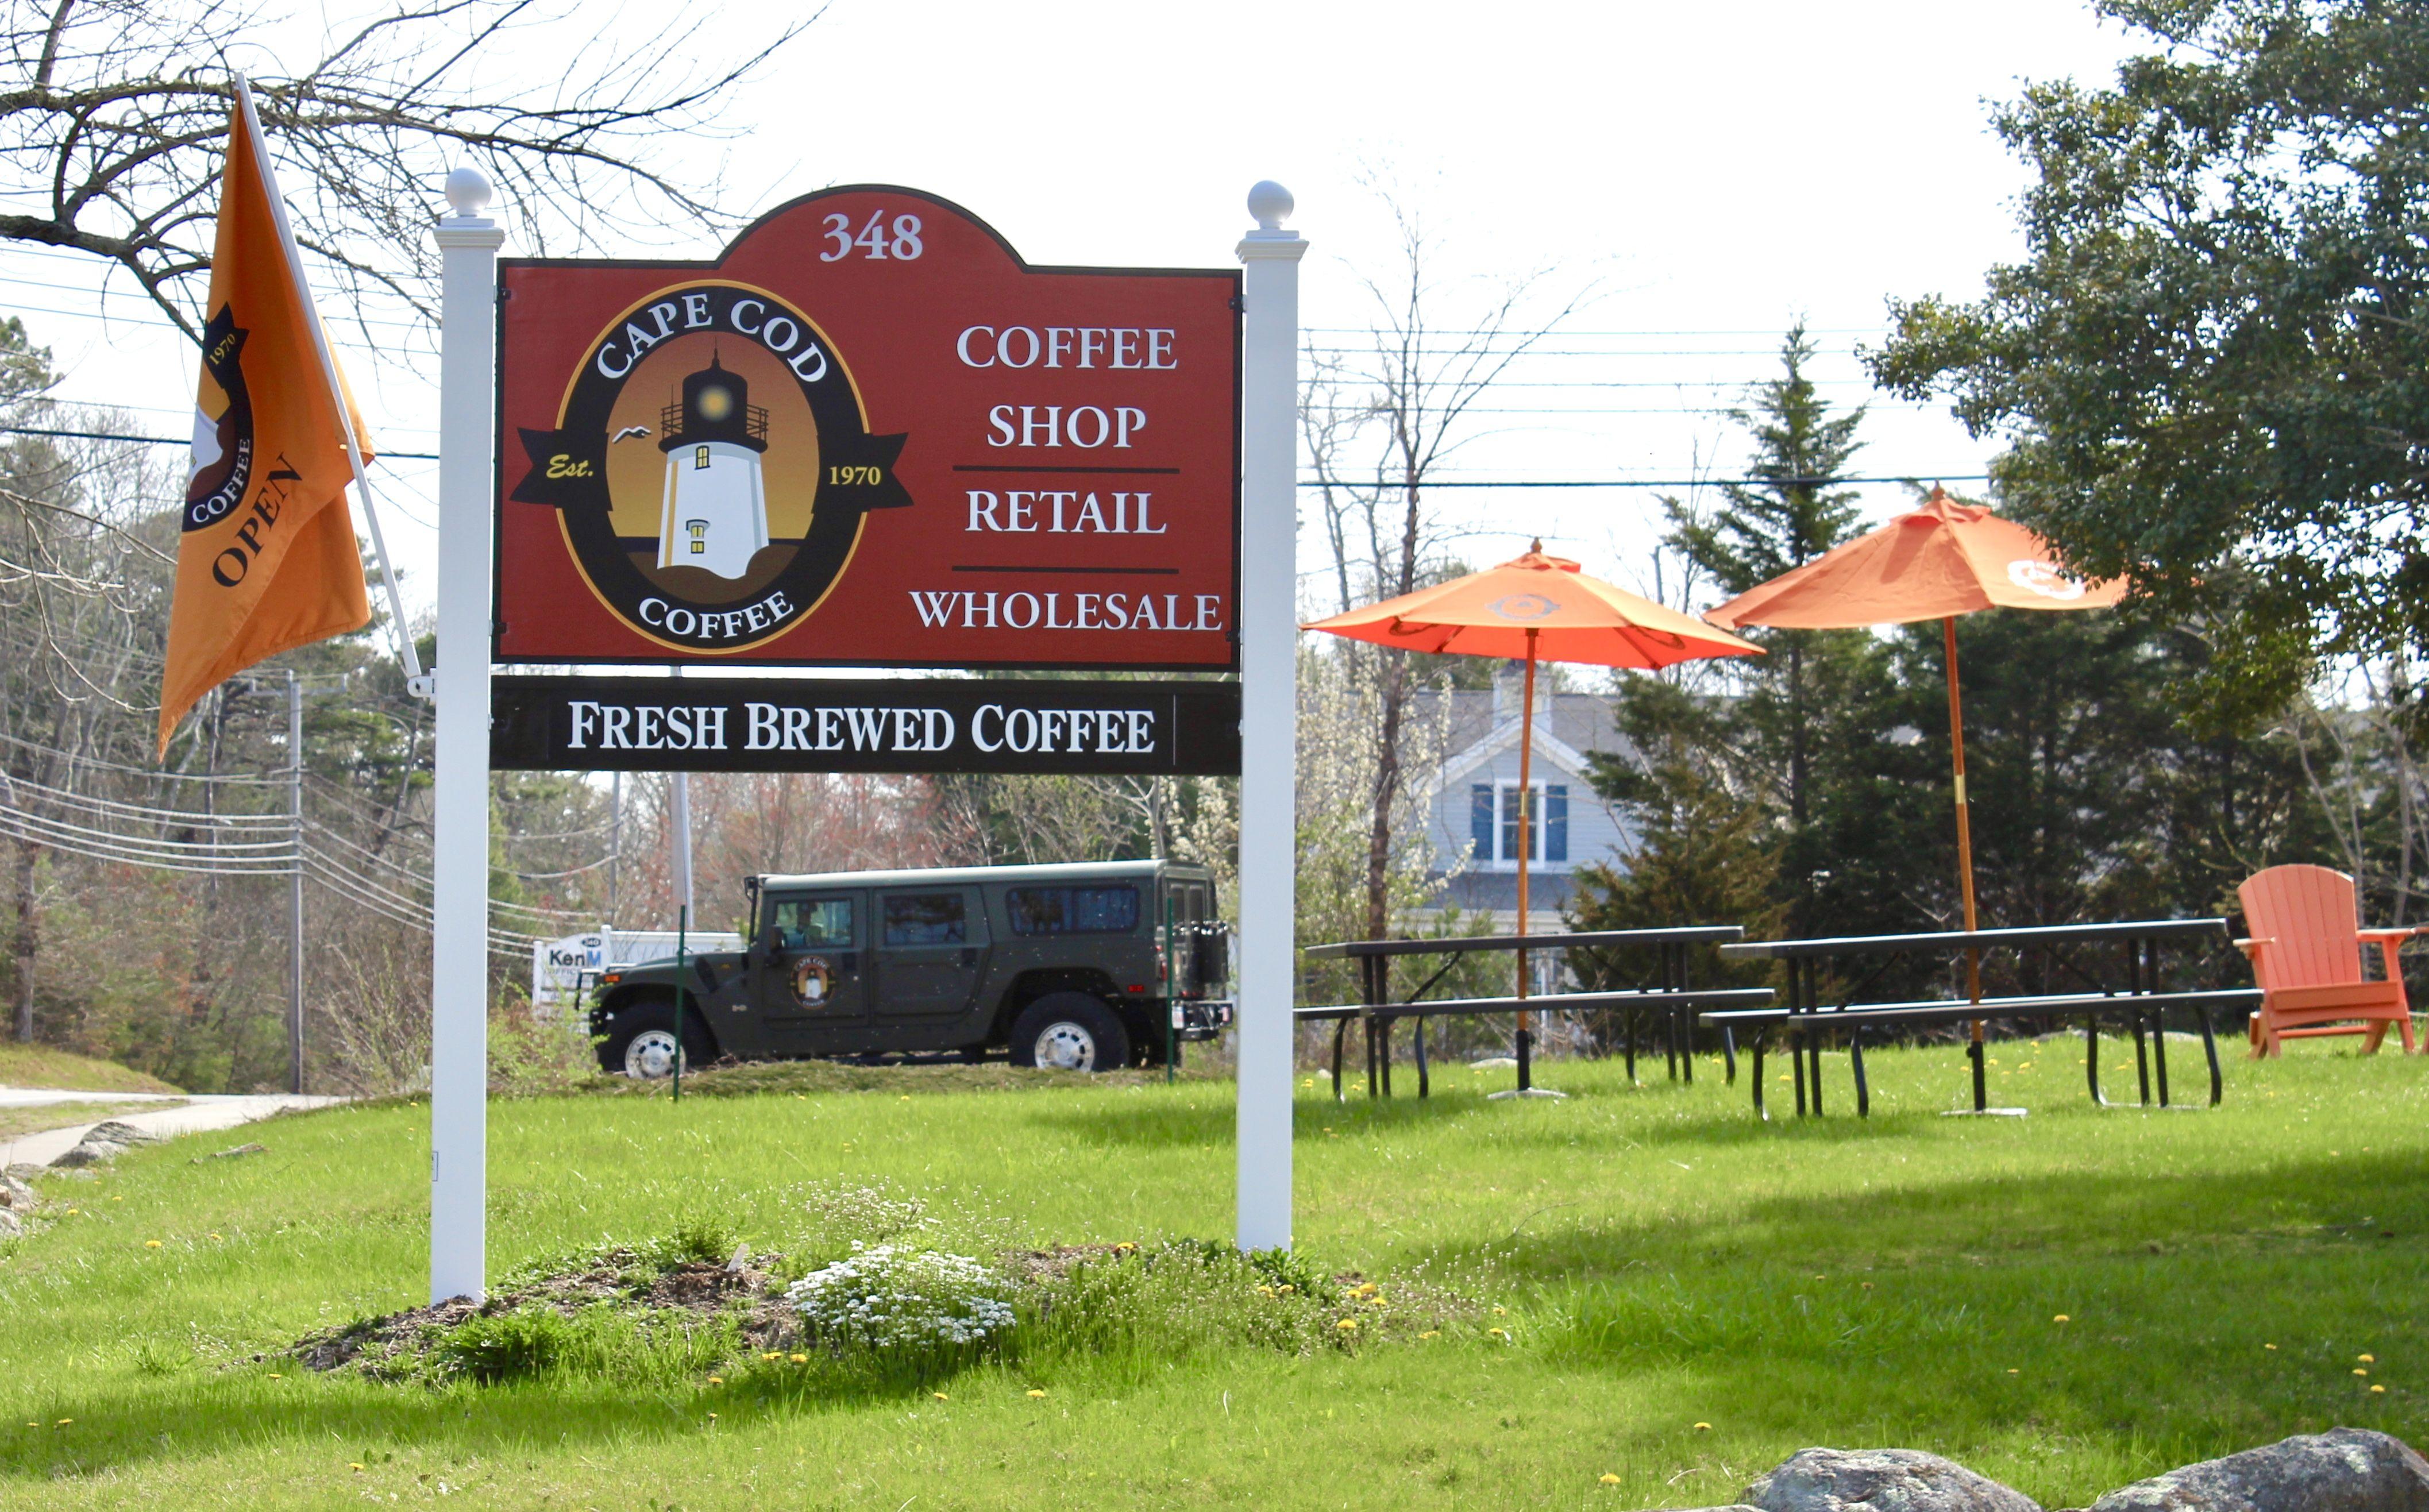 Cape cod coffees roasting facility in mashpee great